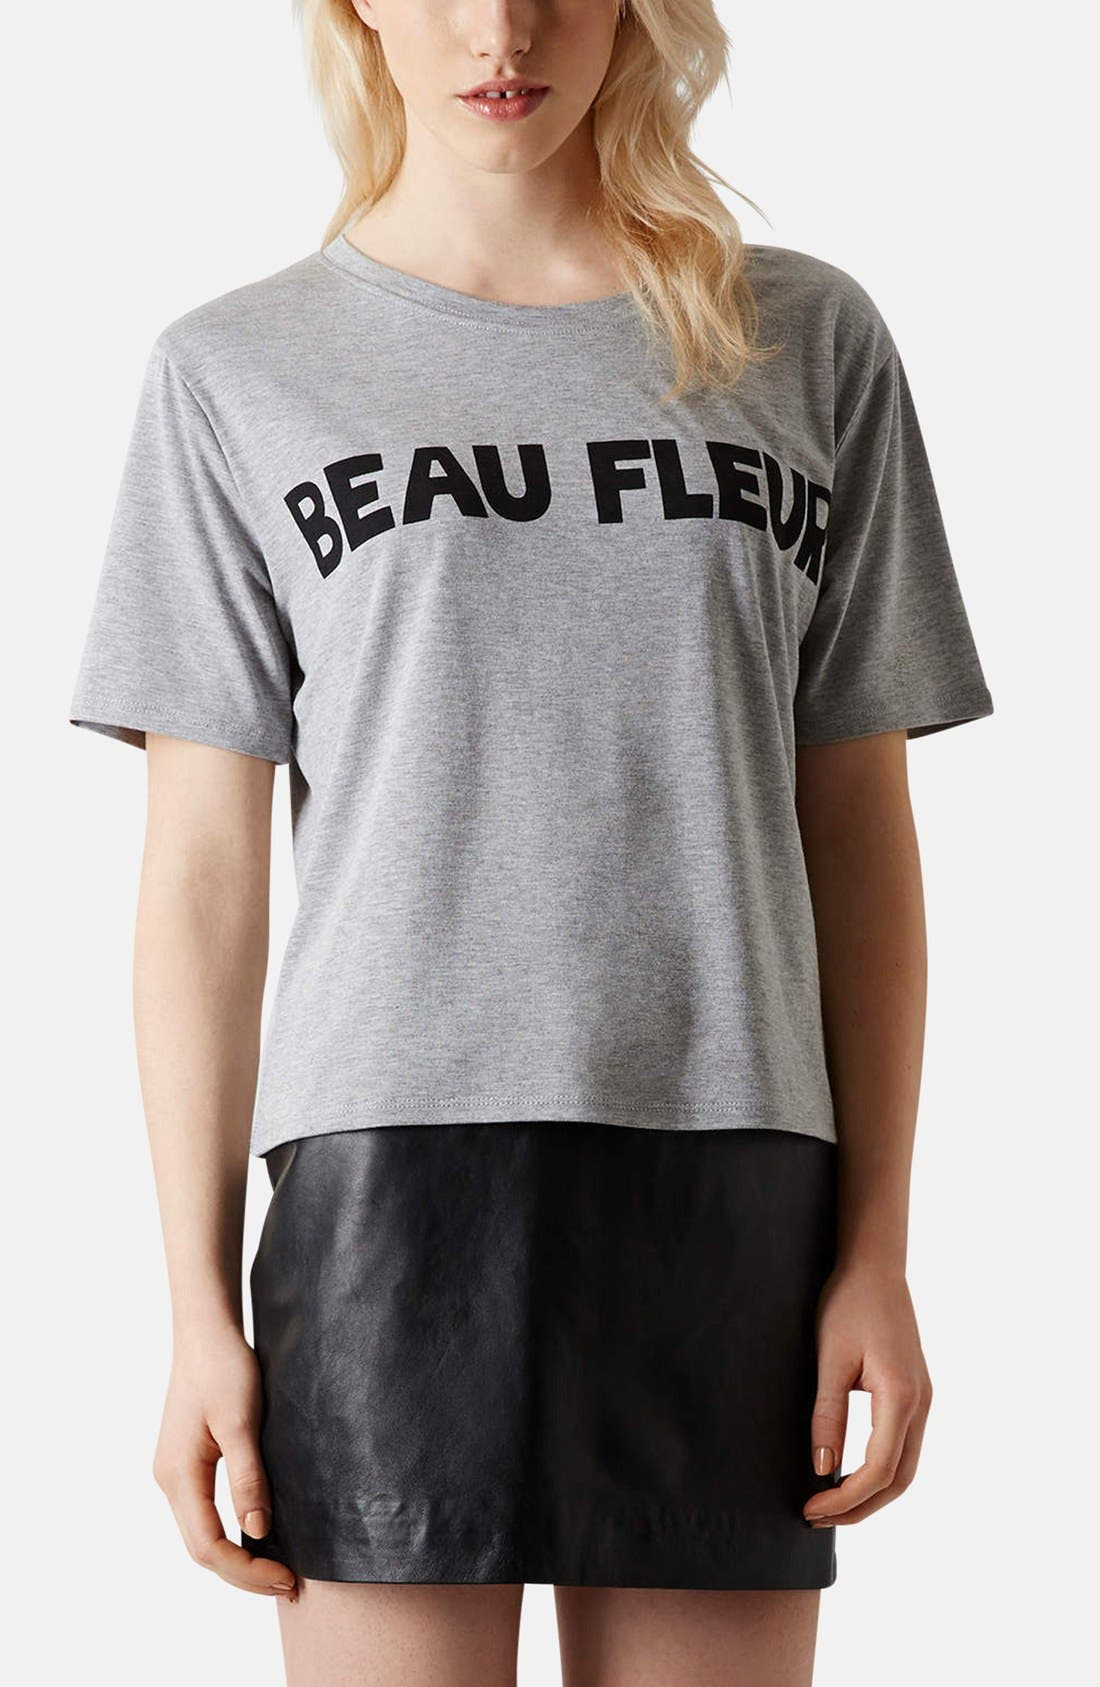 Main Image - Topshop 'Beau Fleur' Graphic Tee